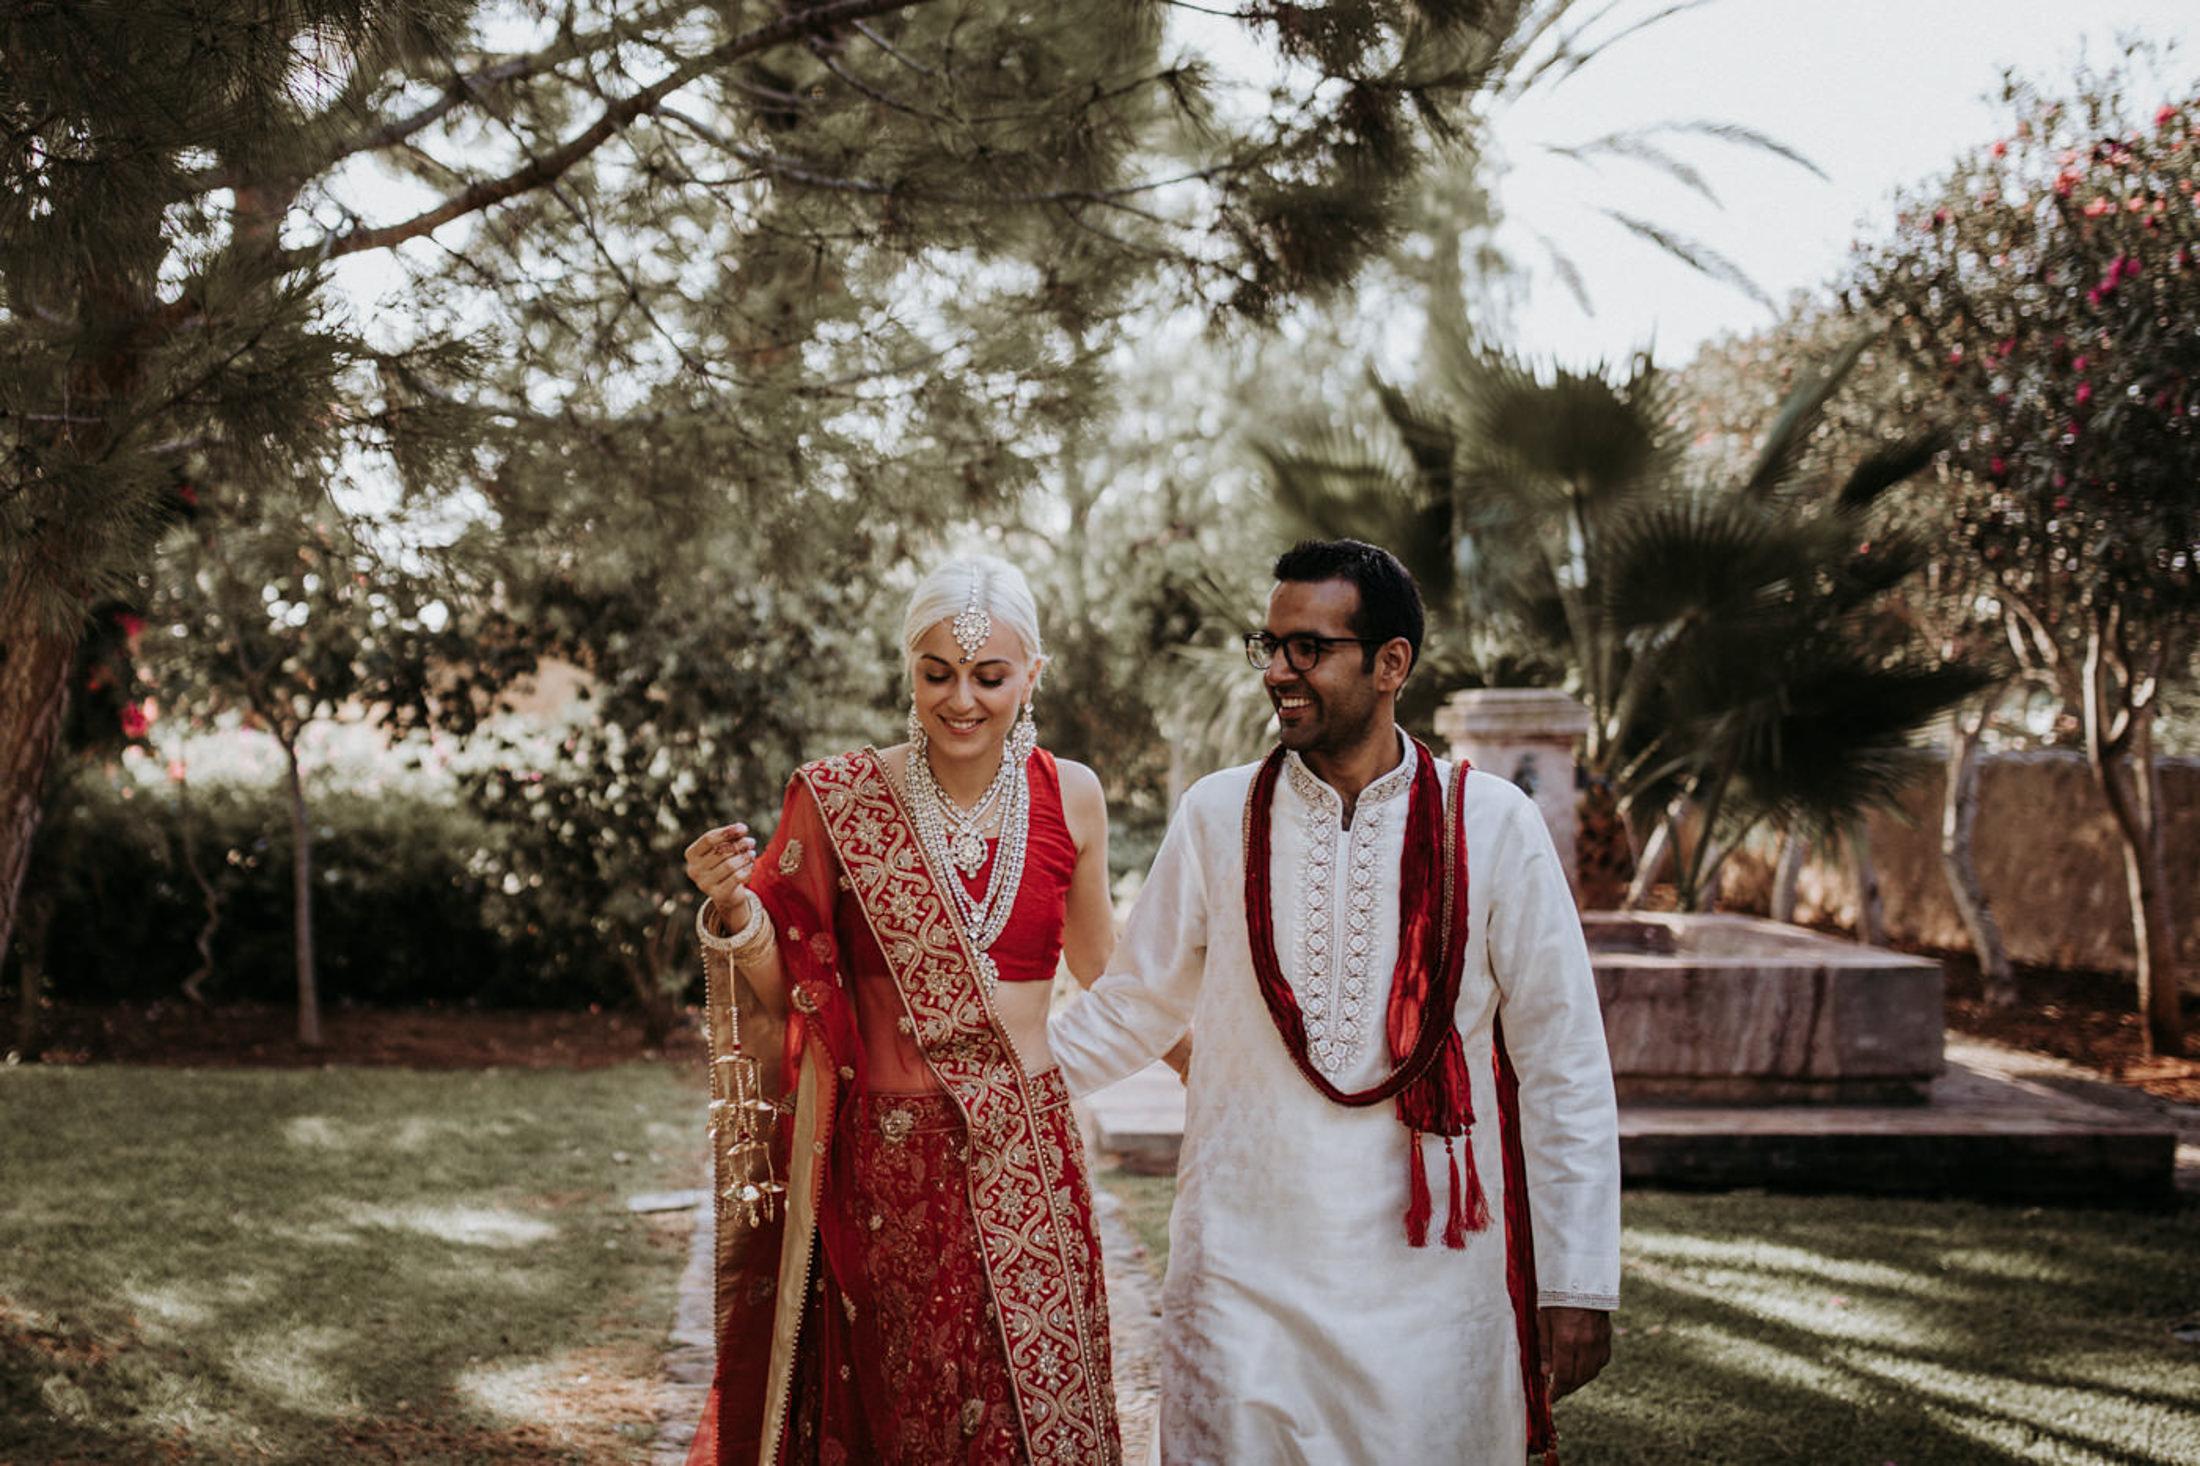 Wedding_Photographer_Mallorca_Daniela-Marquardt_Photography_New_York_Iceland_Tuscany_Santorini_Portugal_Austria_Bavaria_Elopement_Hochzeitsfotograf_AntjeRajat2_59